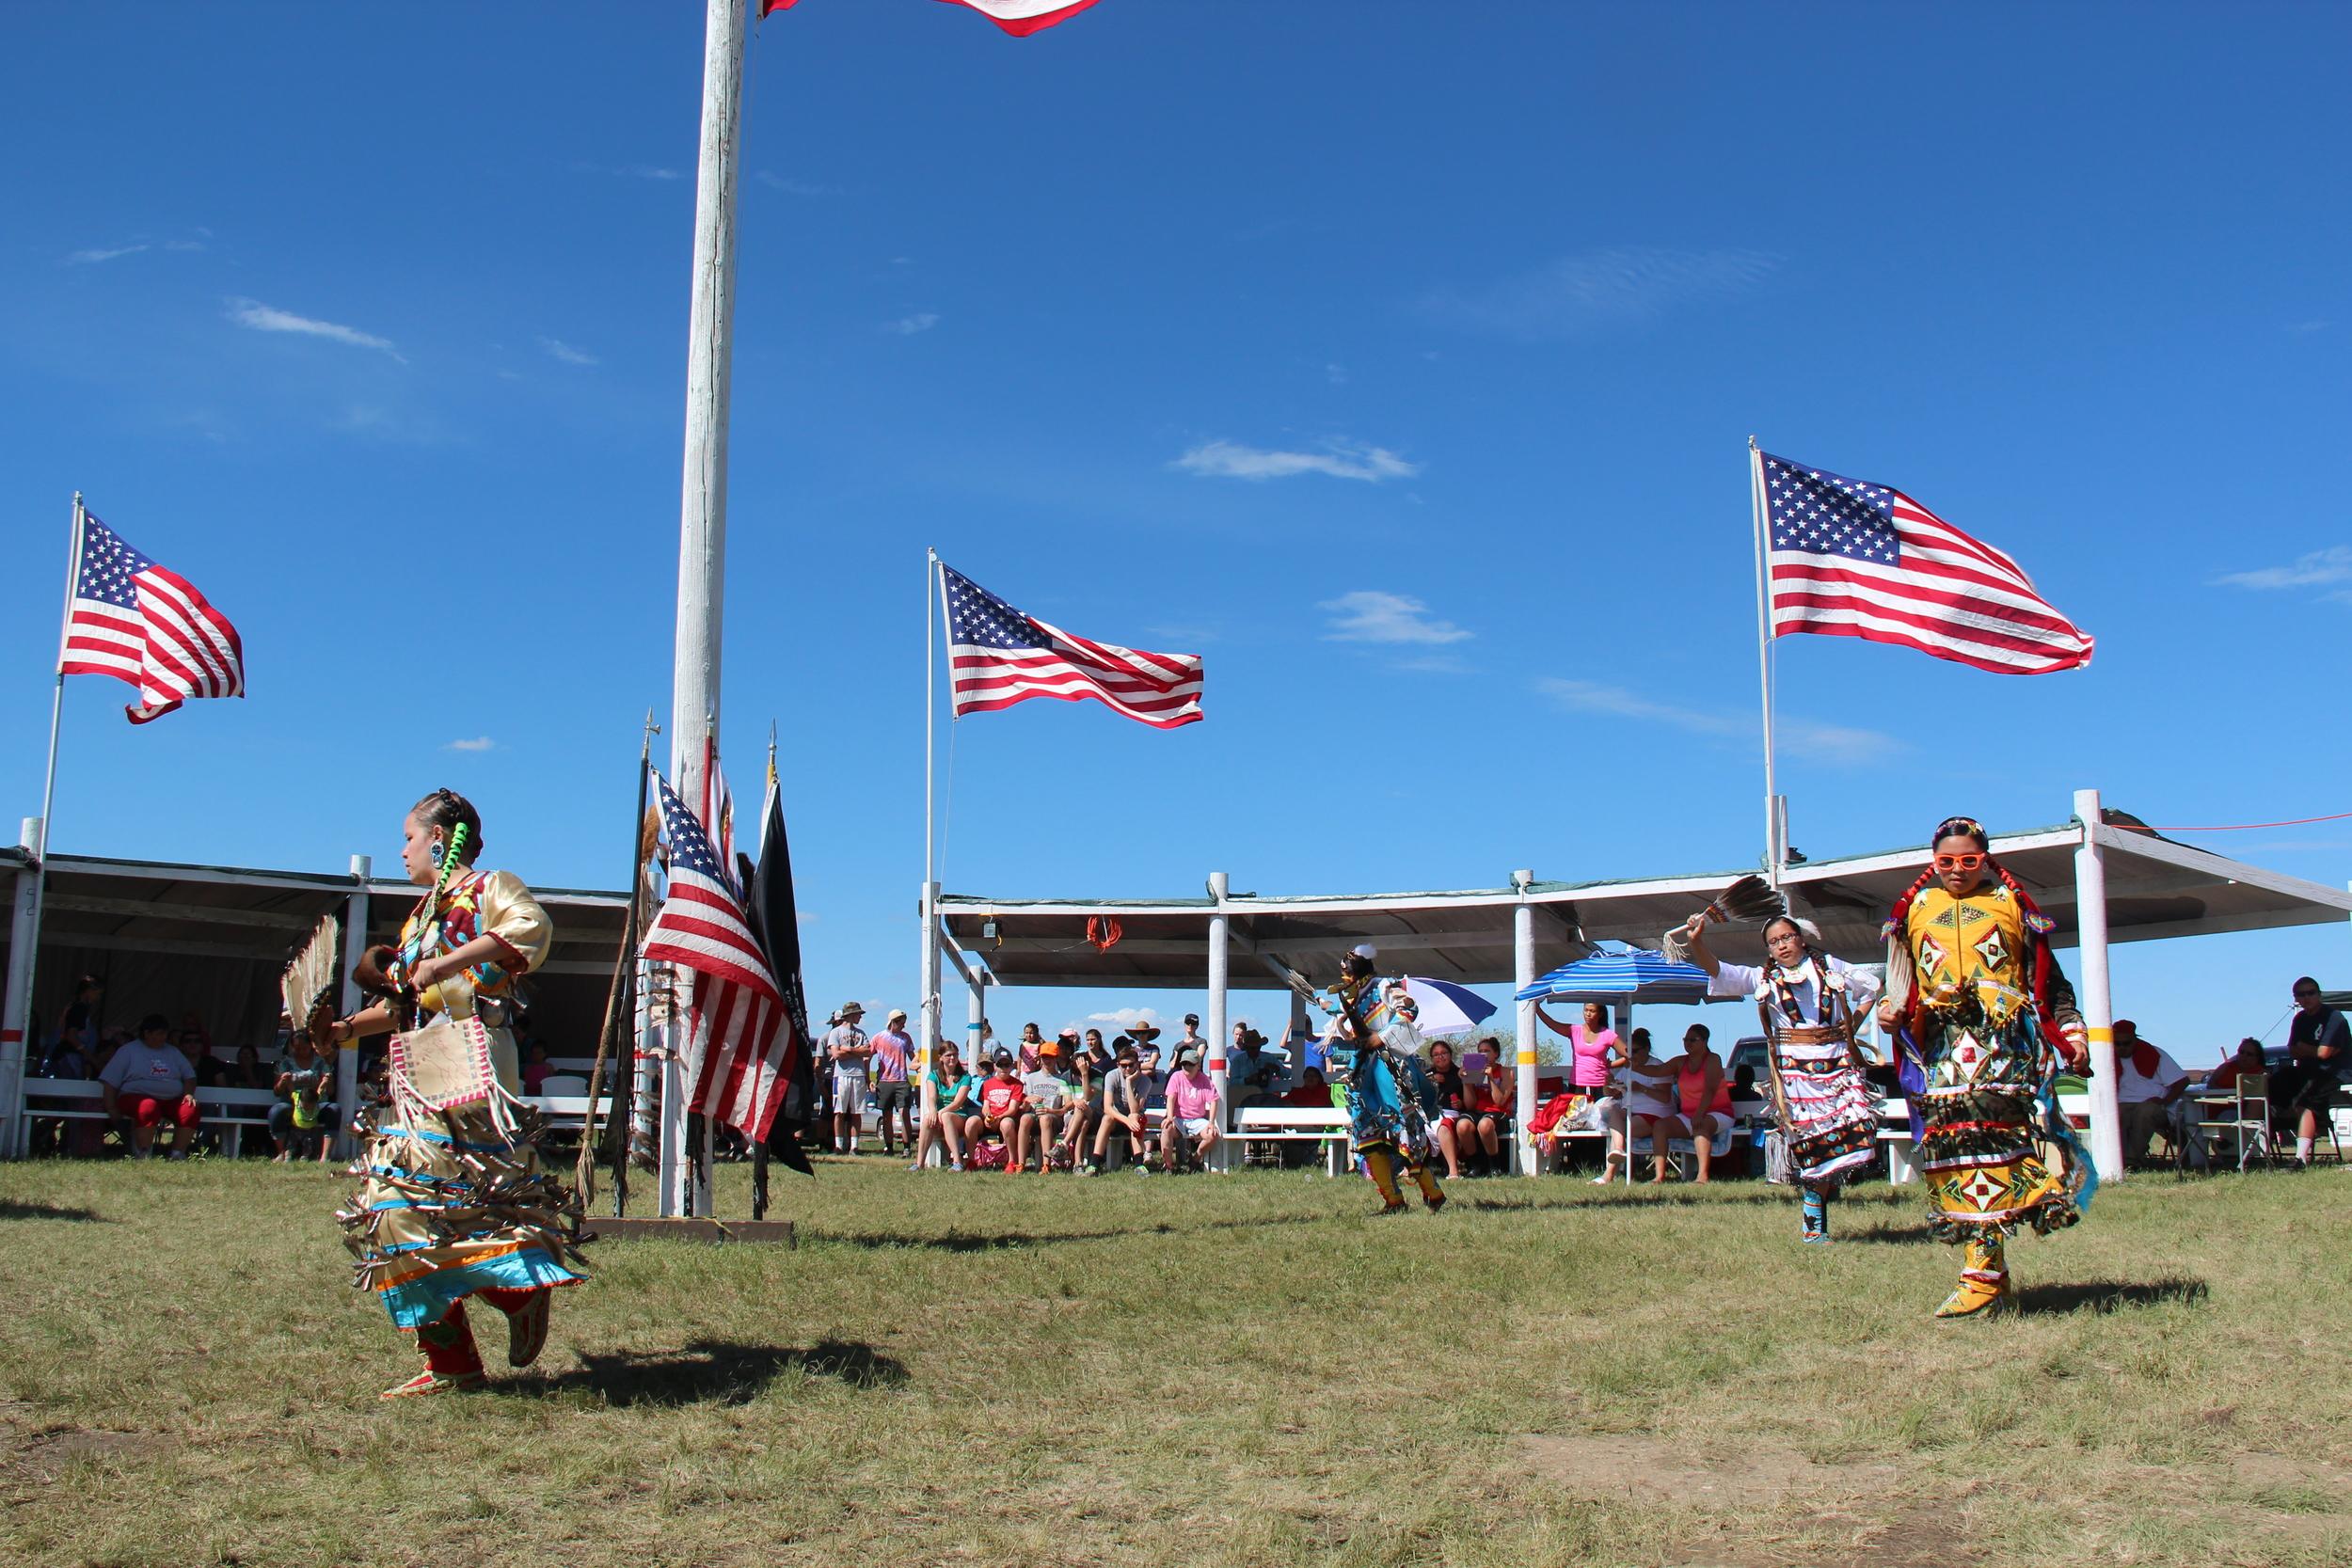 Ceremonial dancing at the town powwow